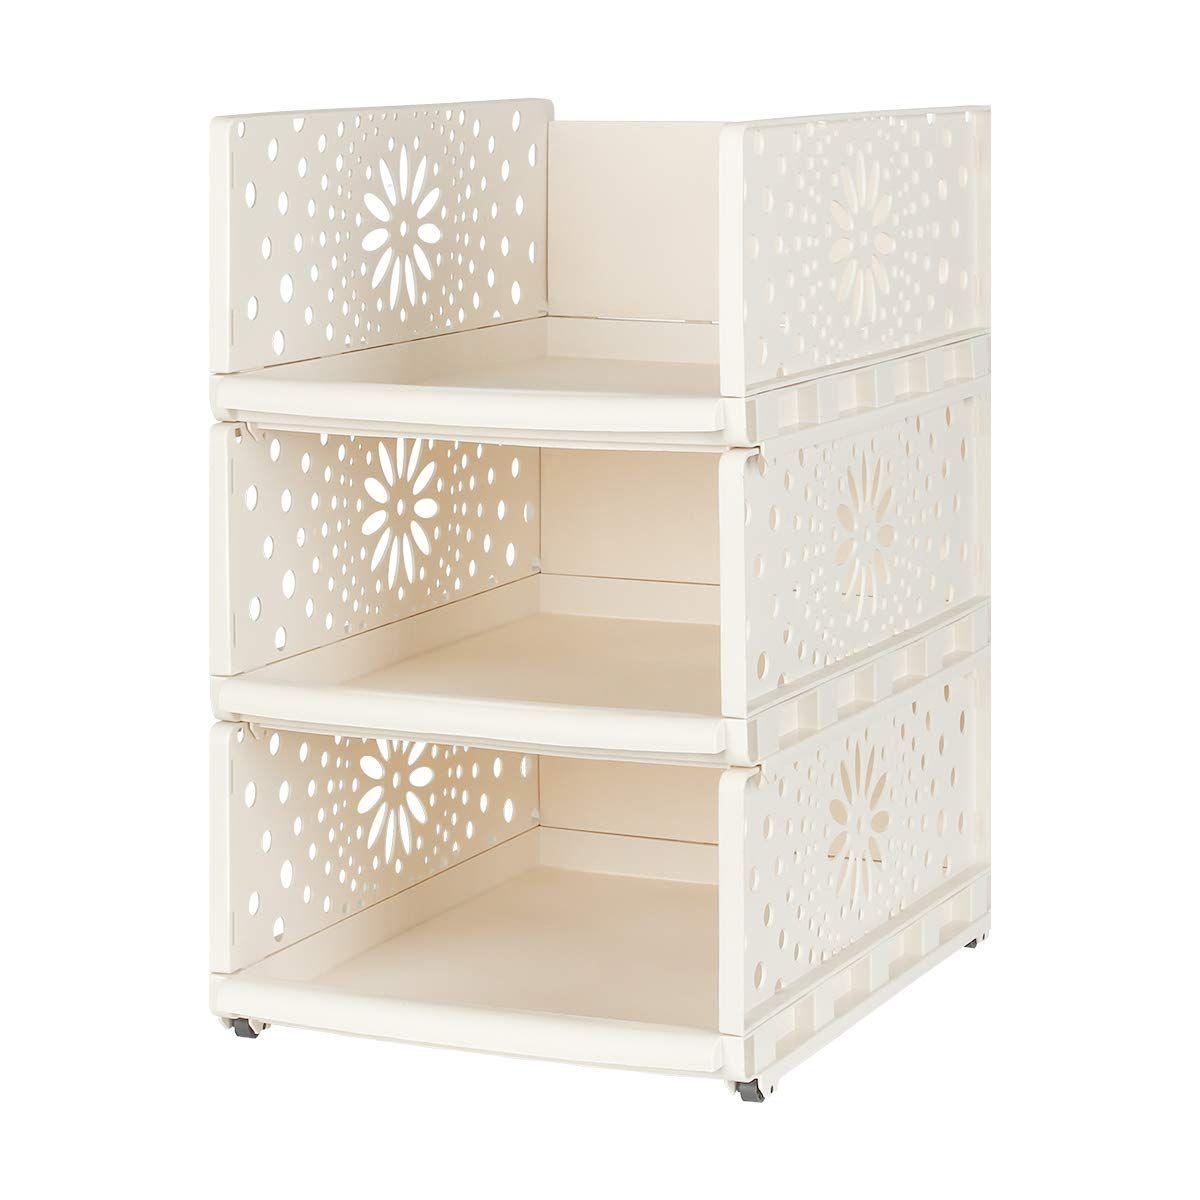 Wardrobe Storage Organiser Box 1 Pcs Plastic Stackable Detachable Storage Box Shelves Closet Organiser For In 2020 Wardrobe Storage Shelves Closet Shelf Organization